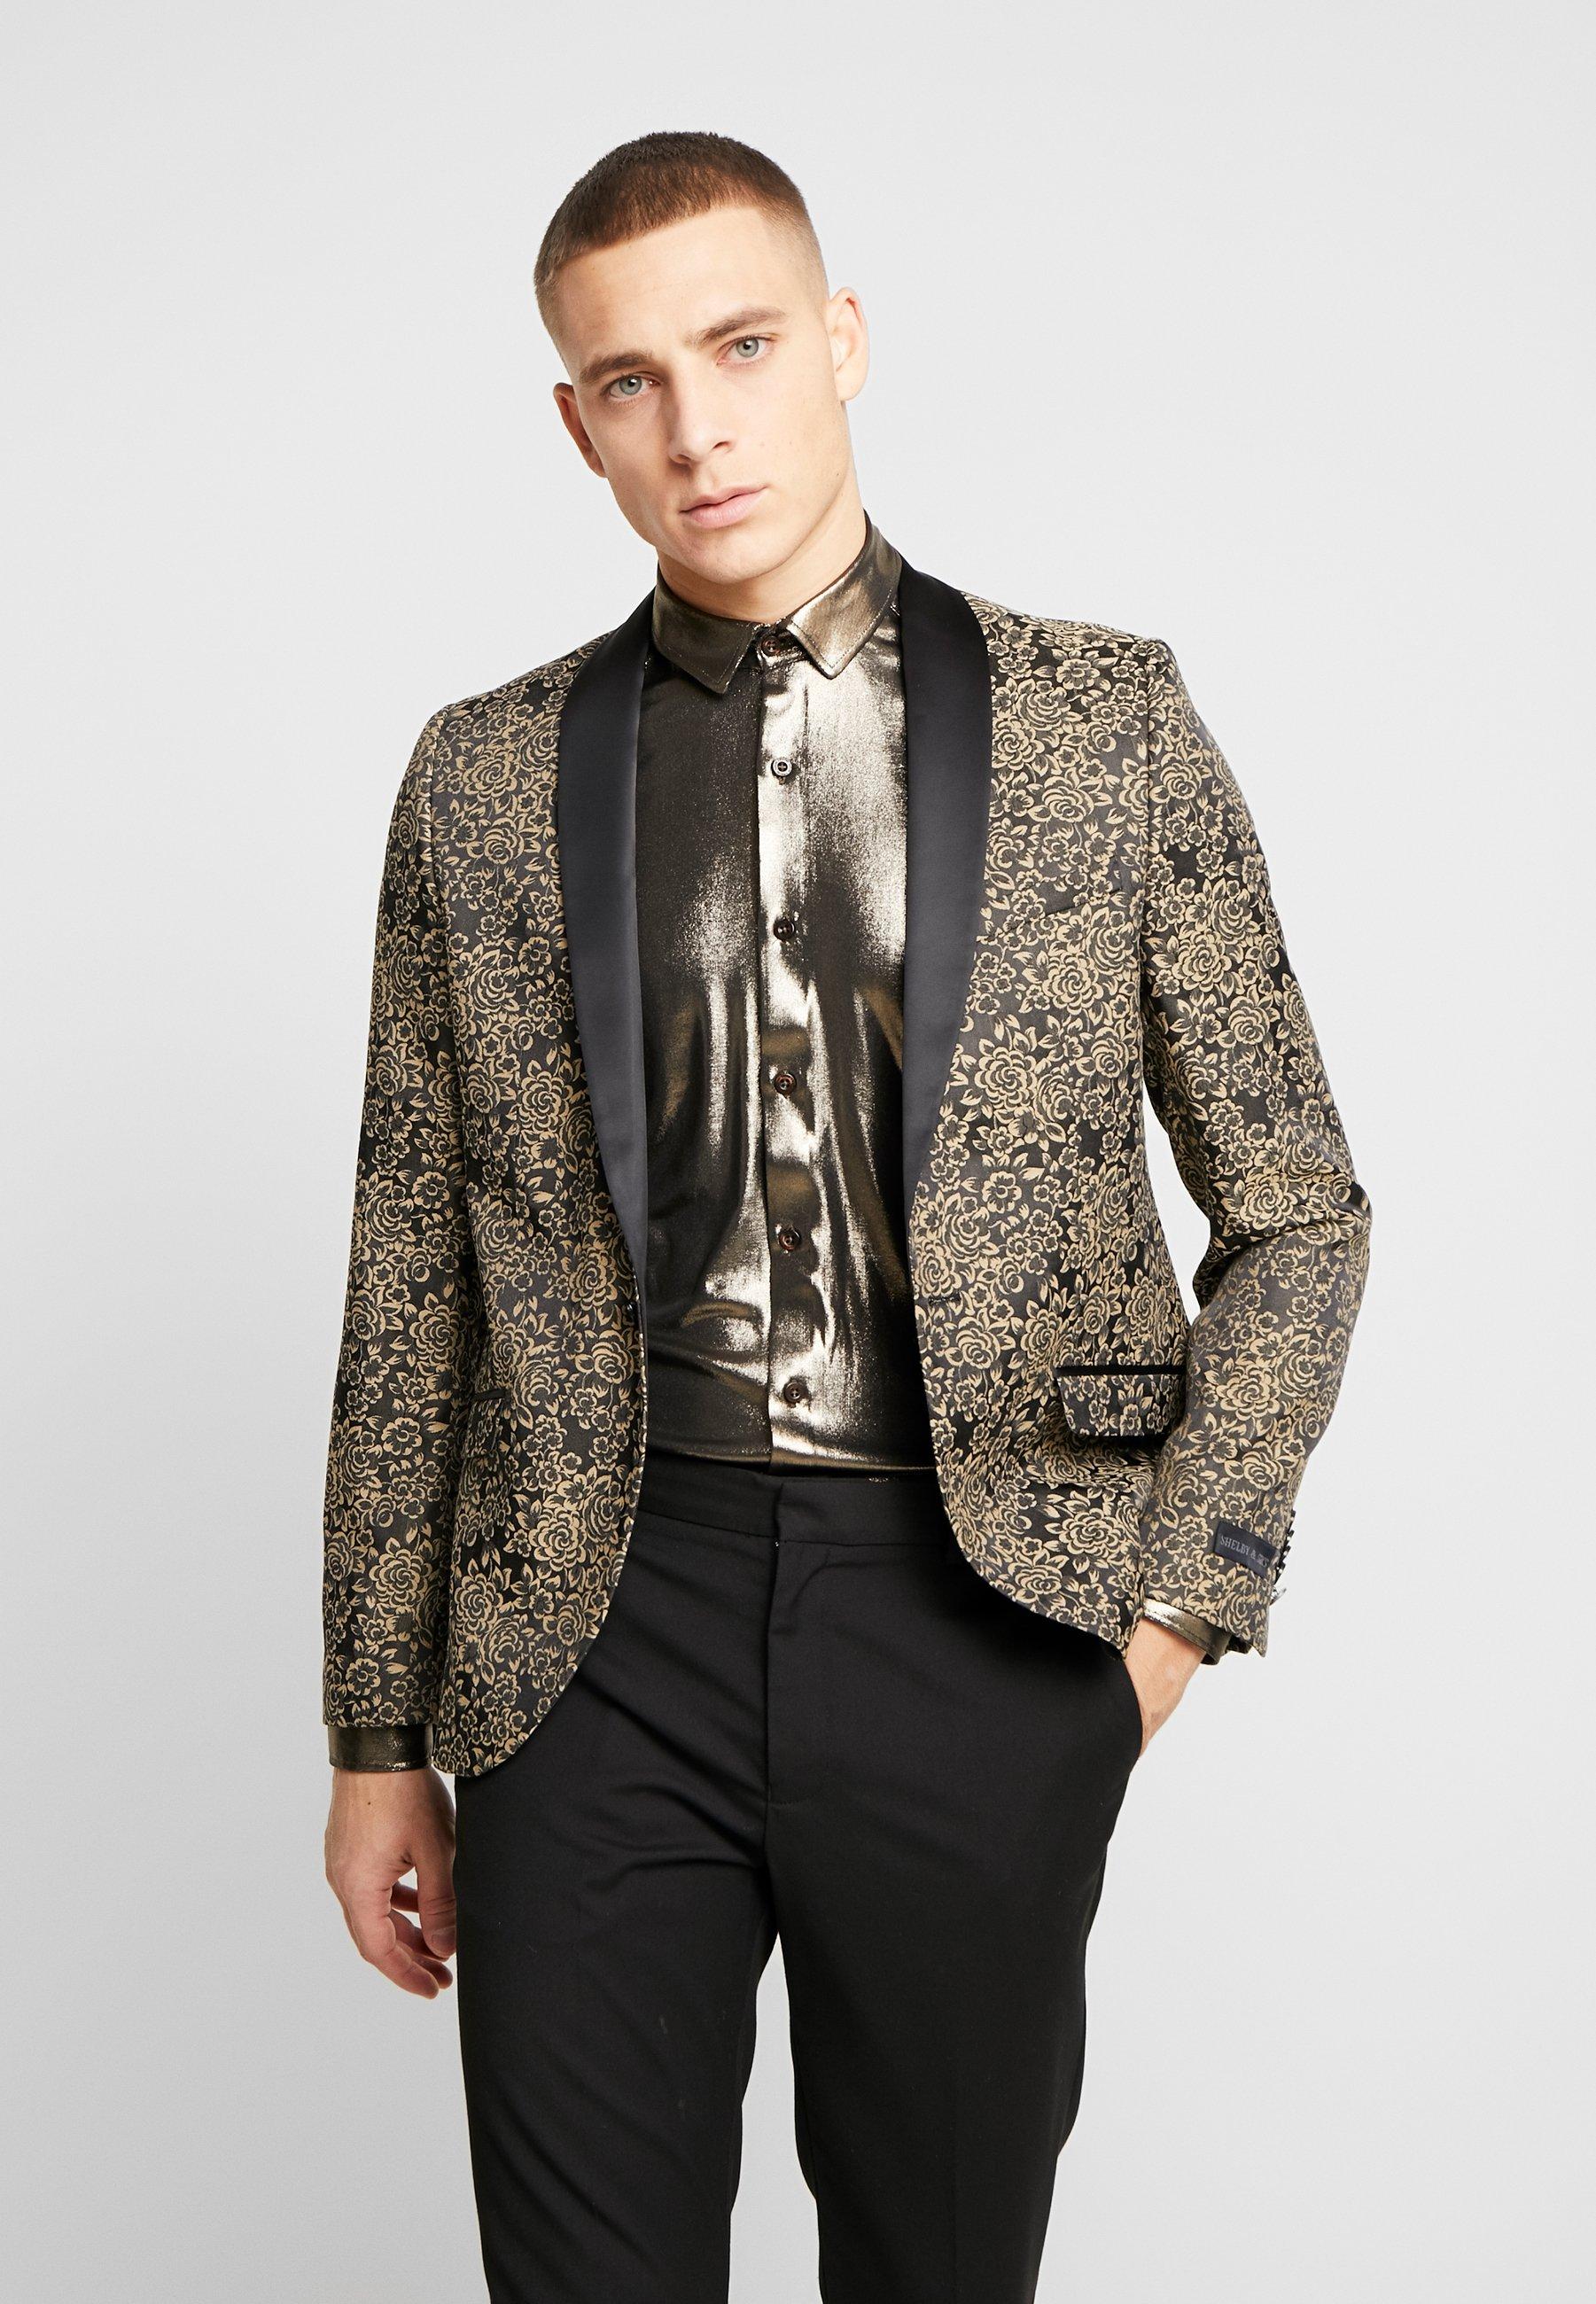 Shelby & Sons WORTHINGTON BLAZER - Chaqueta de traje - black - Ropa de hombre